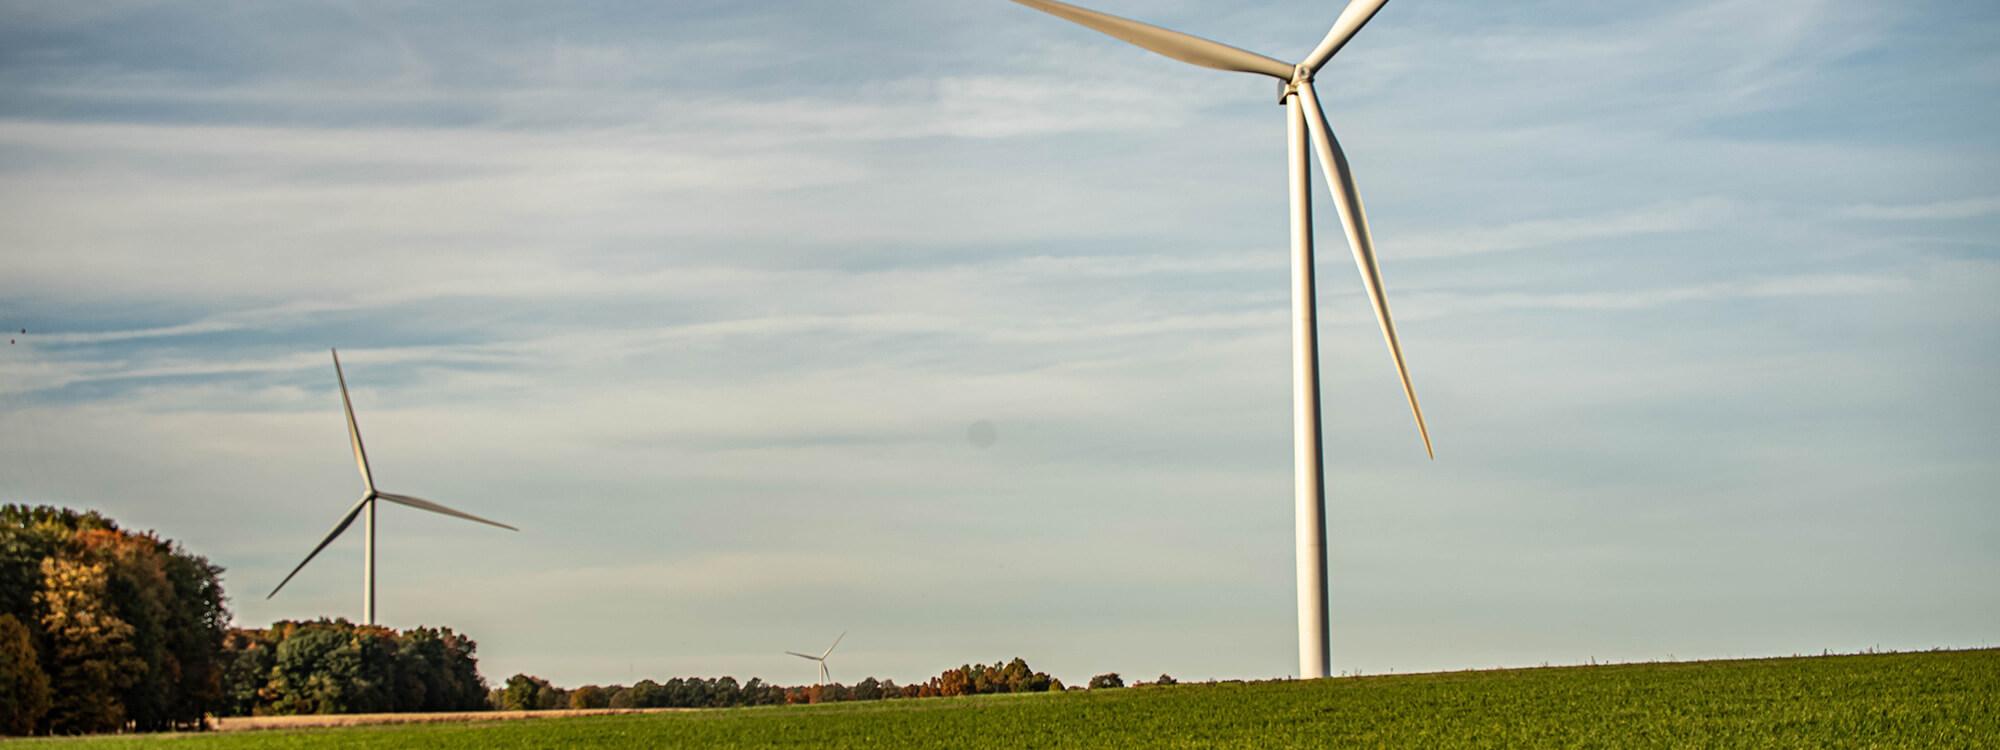 environment - Sustainability